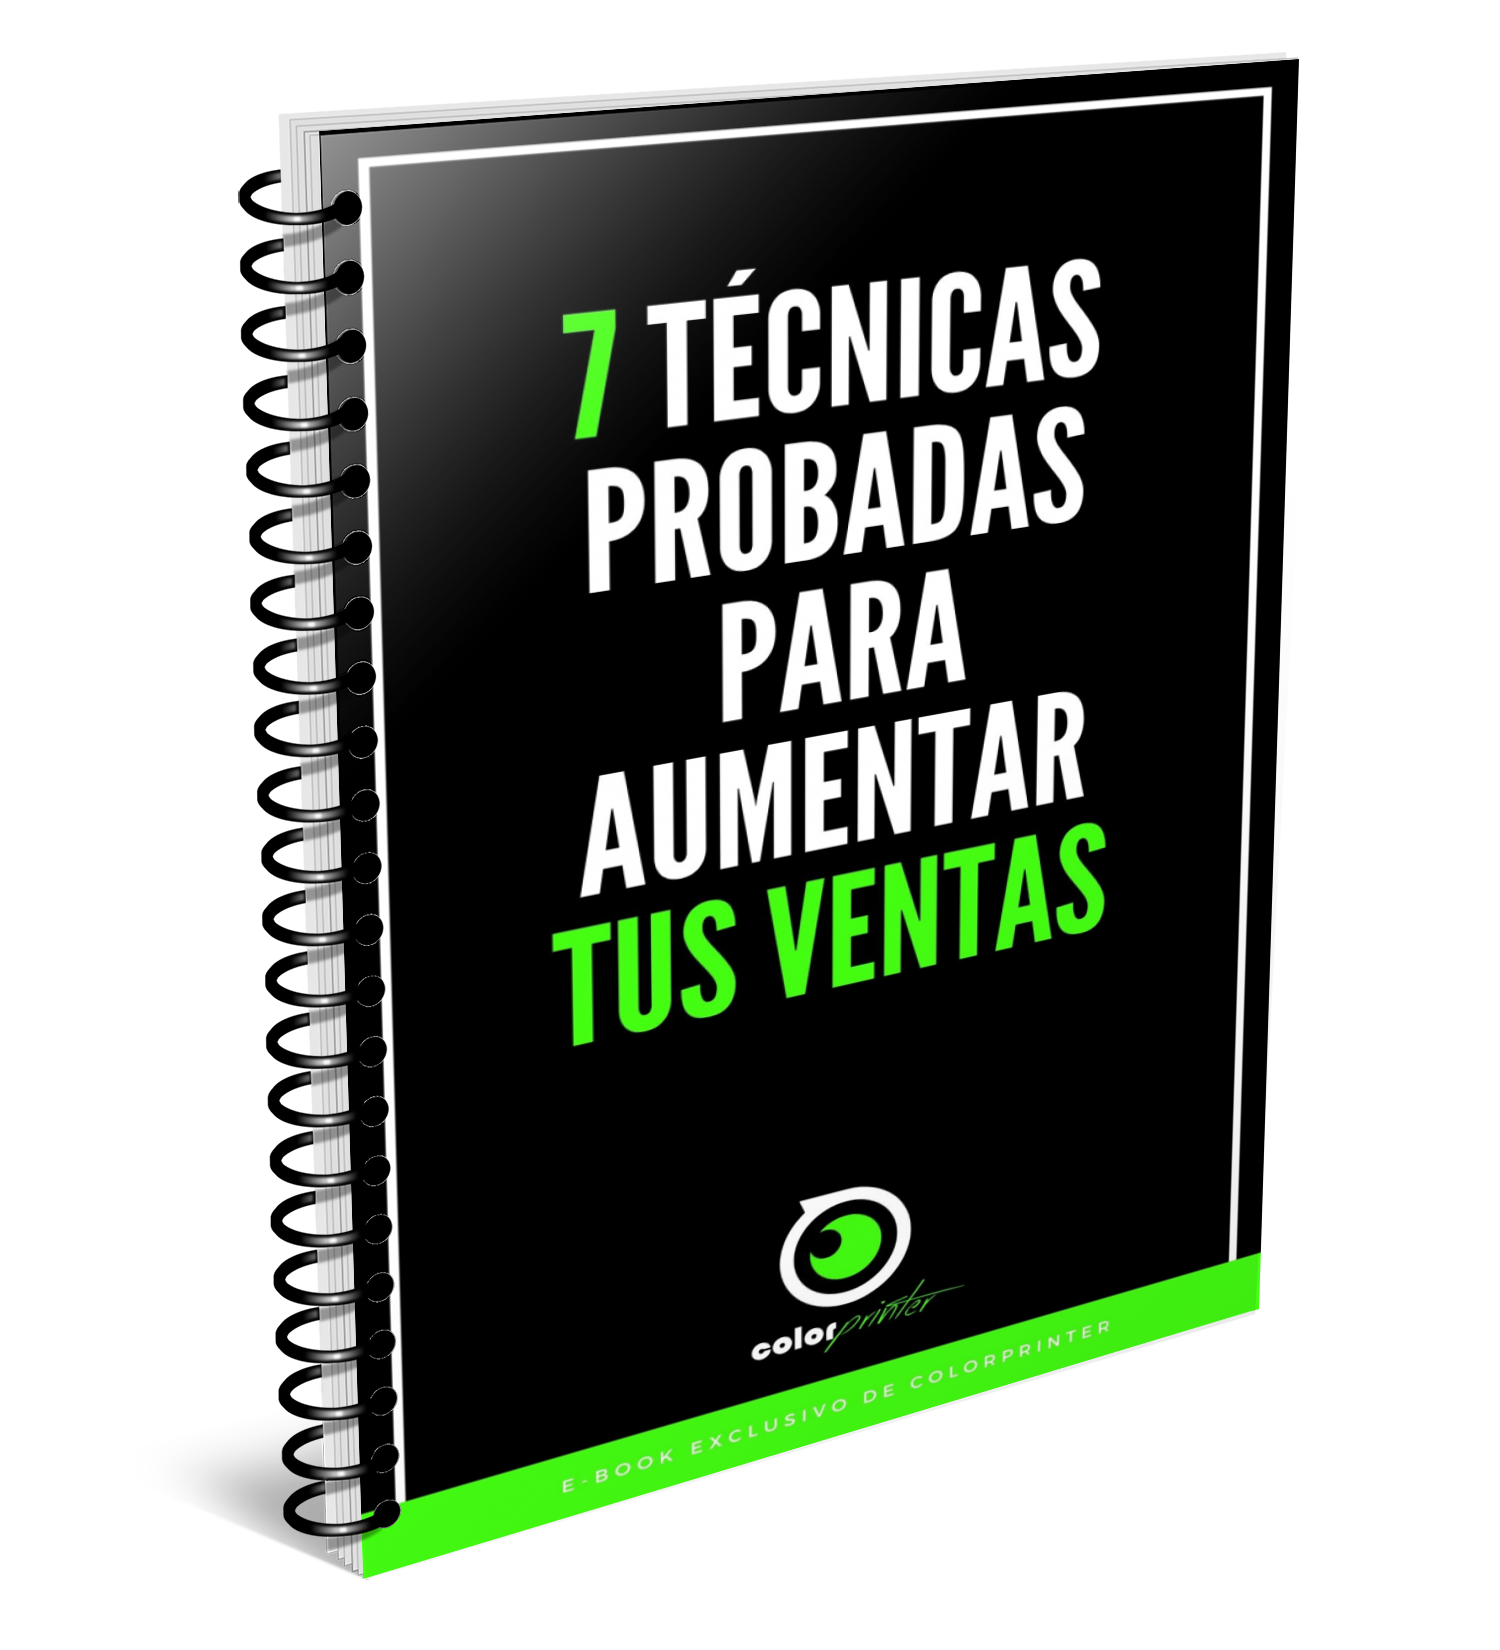 7 técnicas probadas para aumentar tus ventas